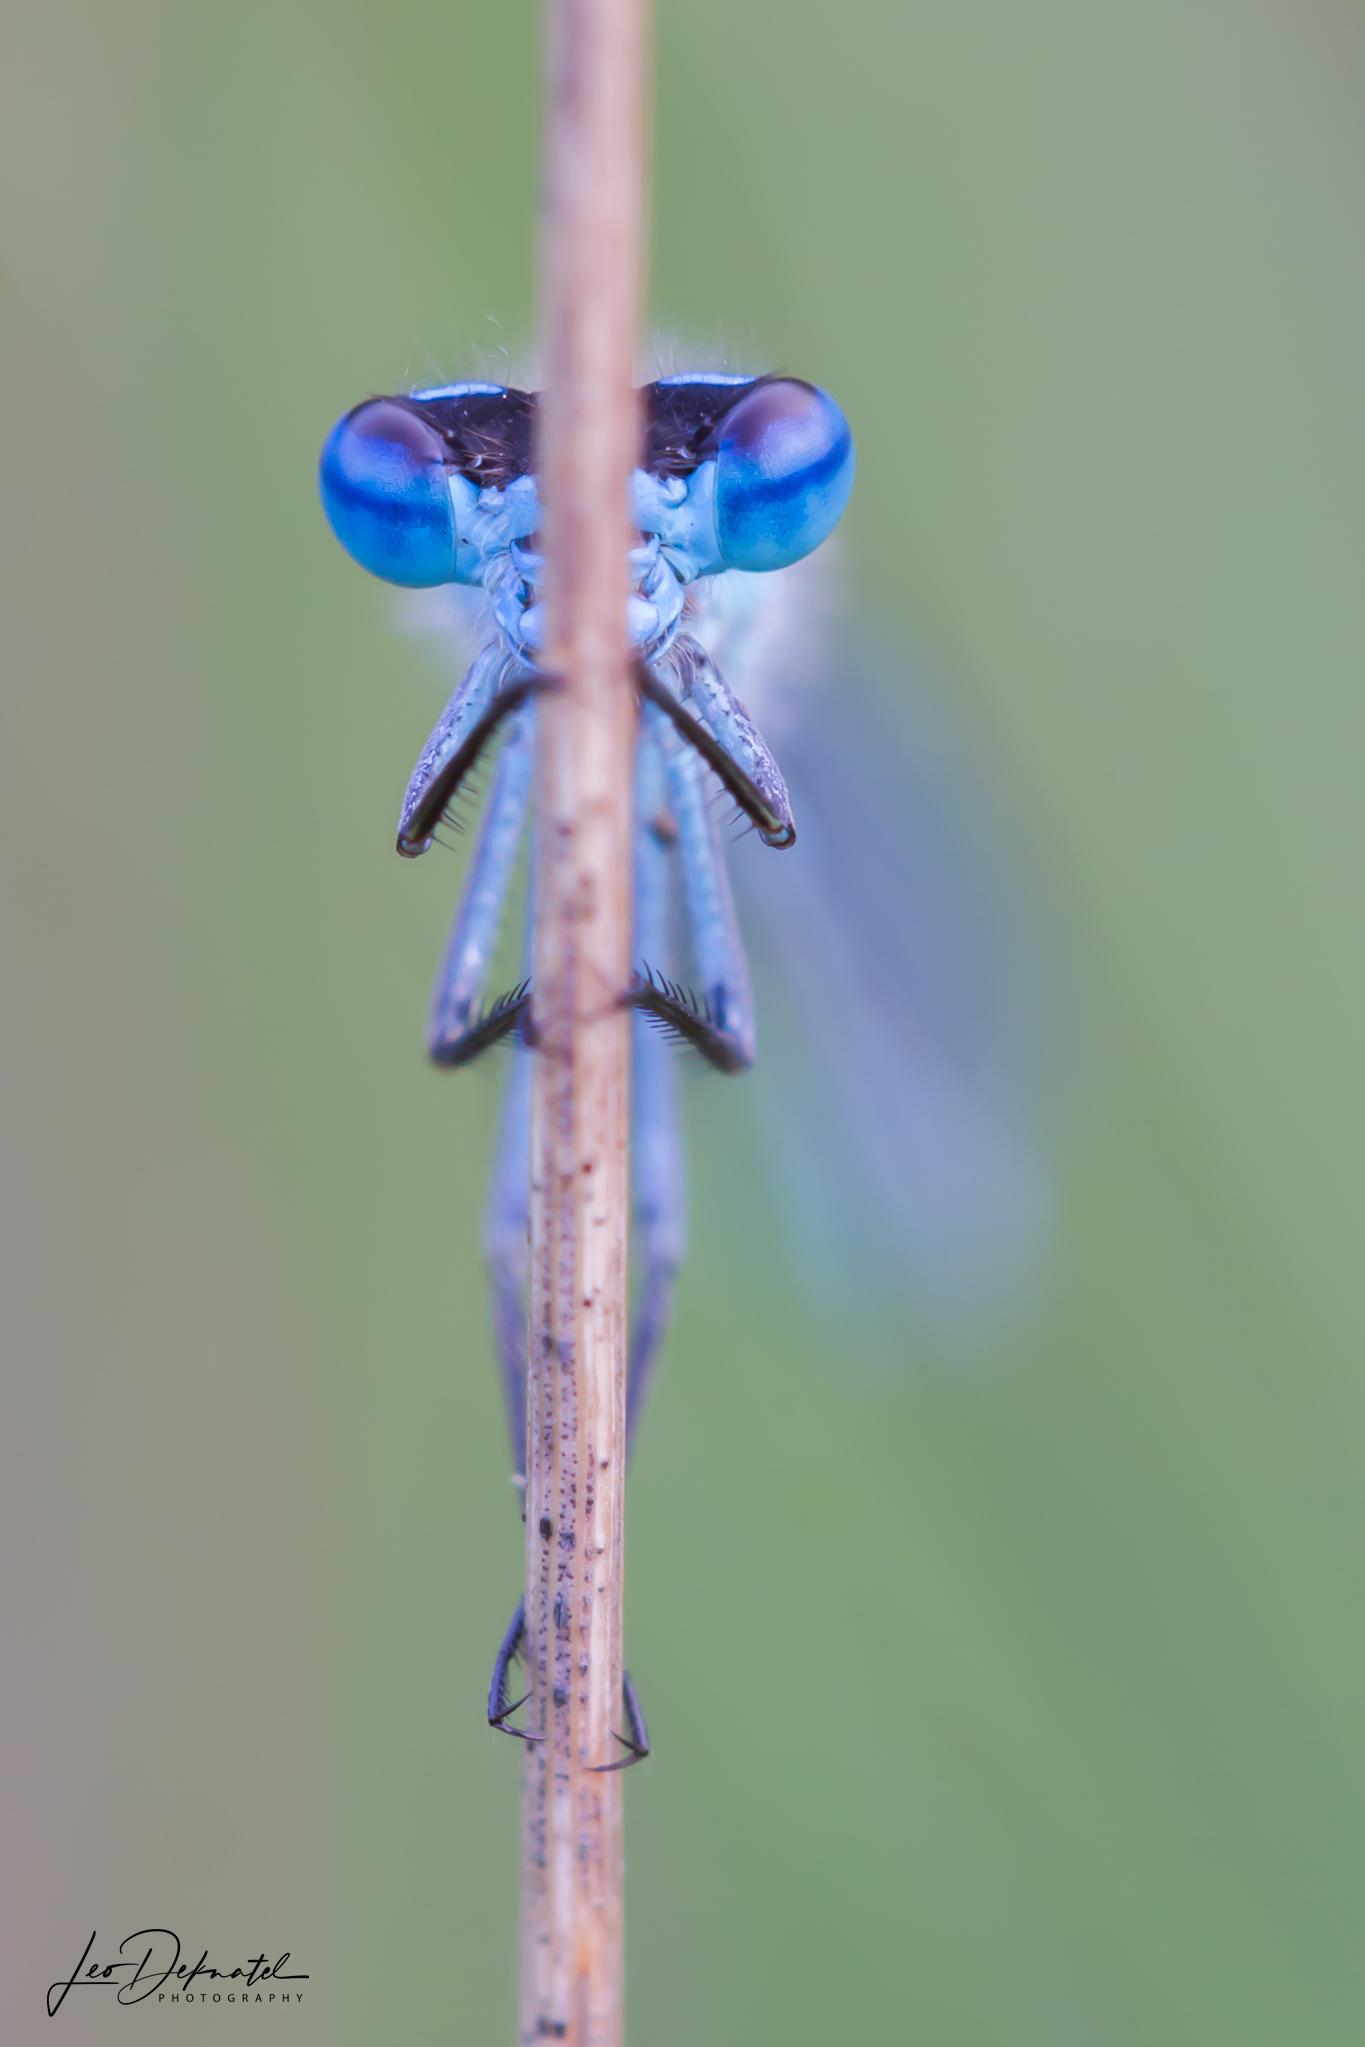 Juffer,Libel, Libelle, Libellen, Macro, Macrofotografie, Fotografie, Natuurfotografie, Juffers, Blauwtje, Blauw